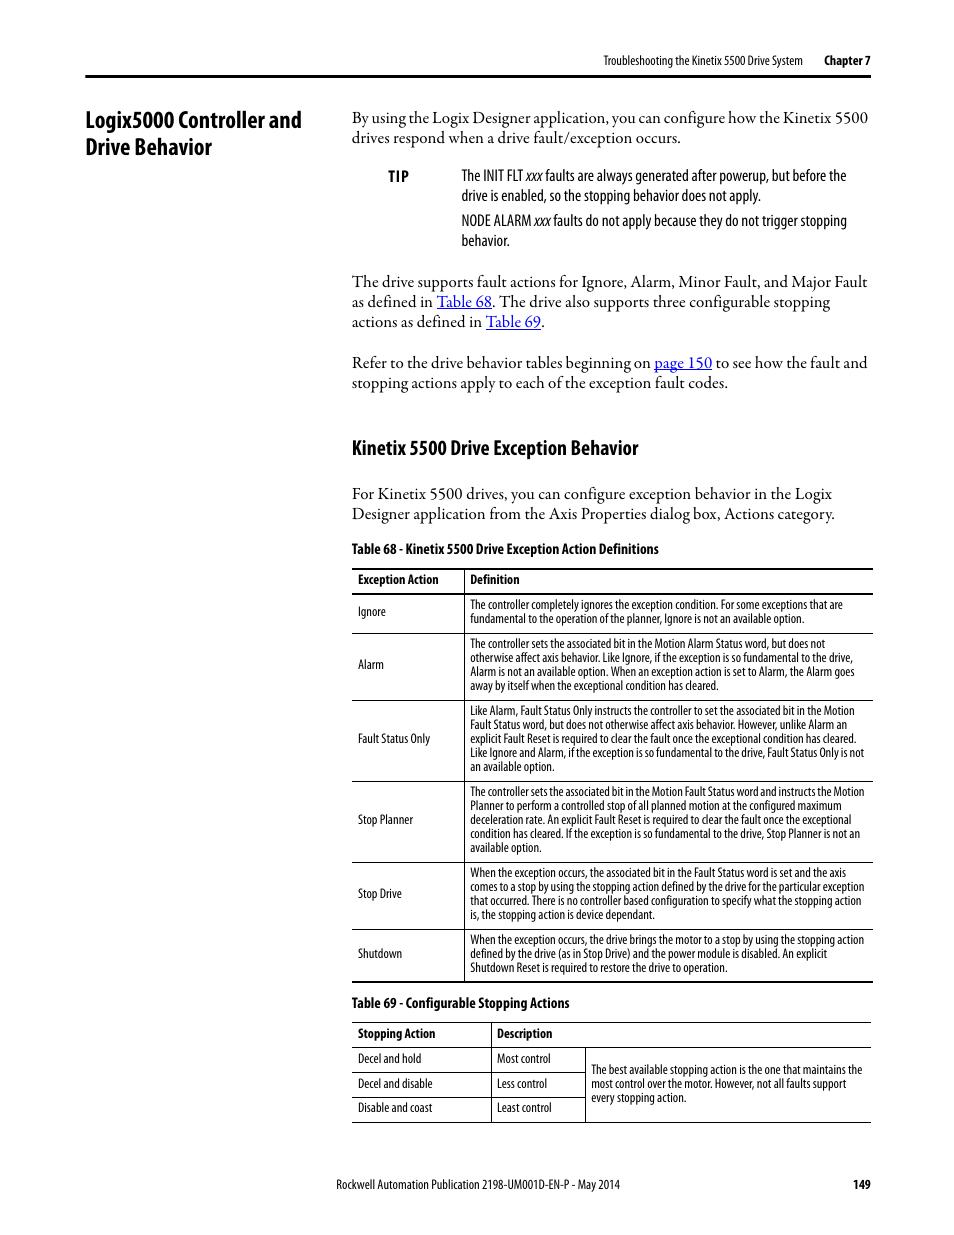 Logix5000 controller and drive behavior, Kinetix 5500 drive